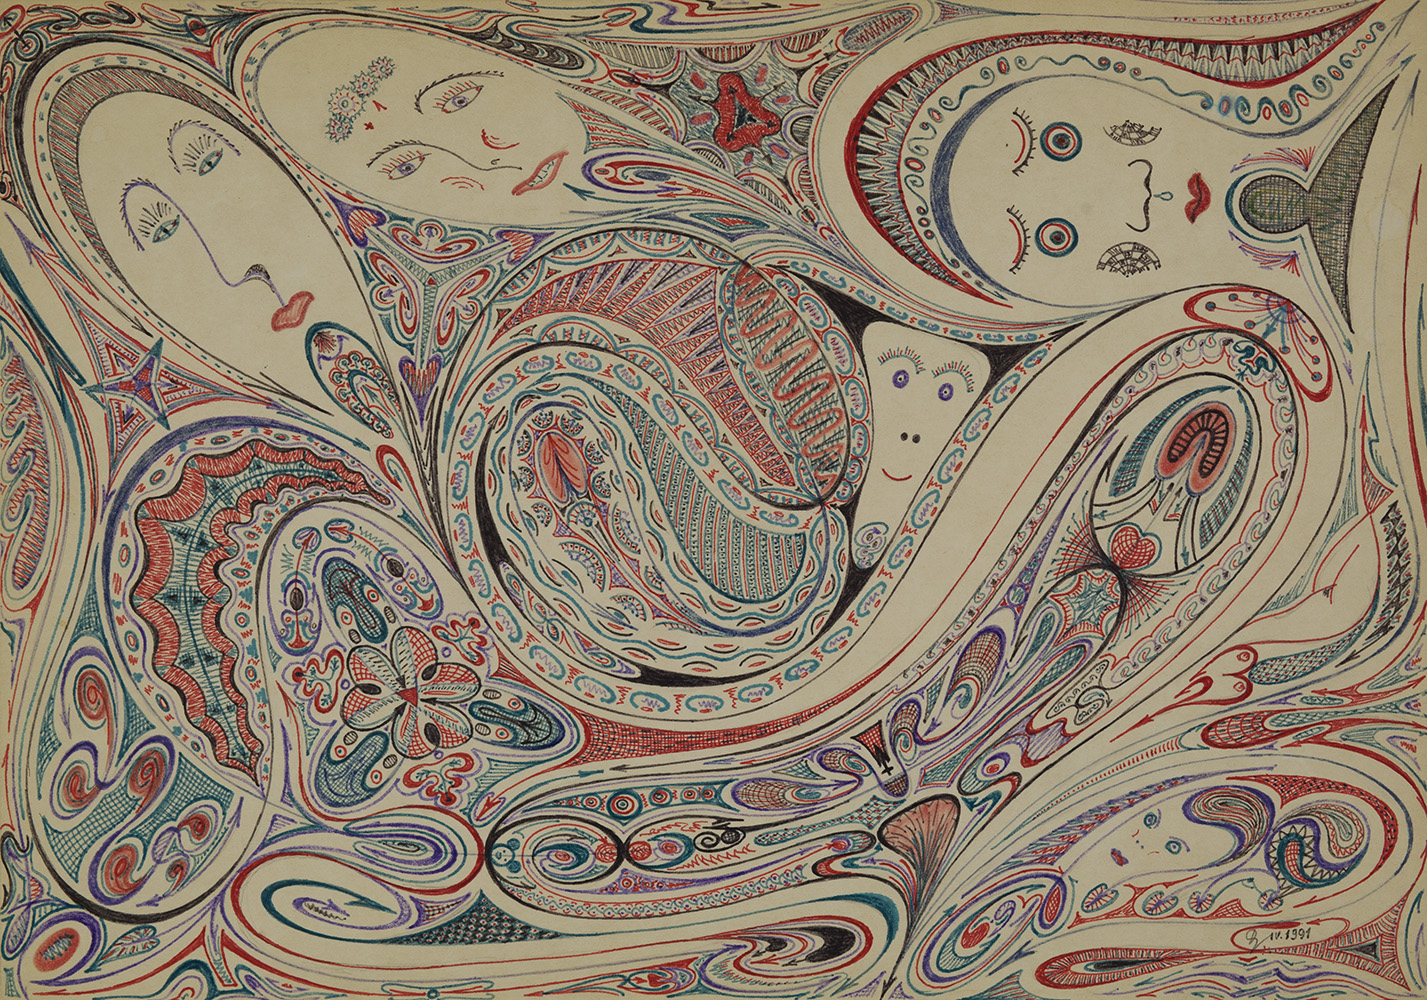 František Dymáček    Untitled  , 1991 Ink on paper 8.25 x 11.75 inches 21 x 29.8 cm FDy 6